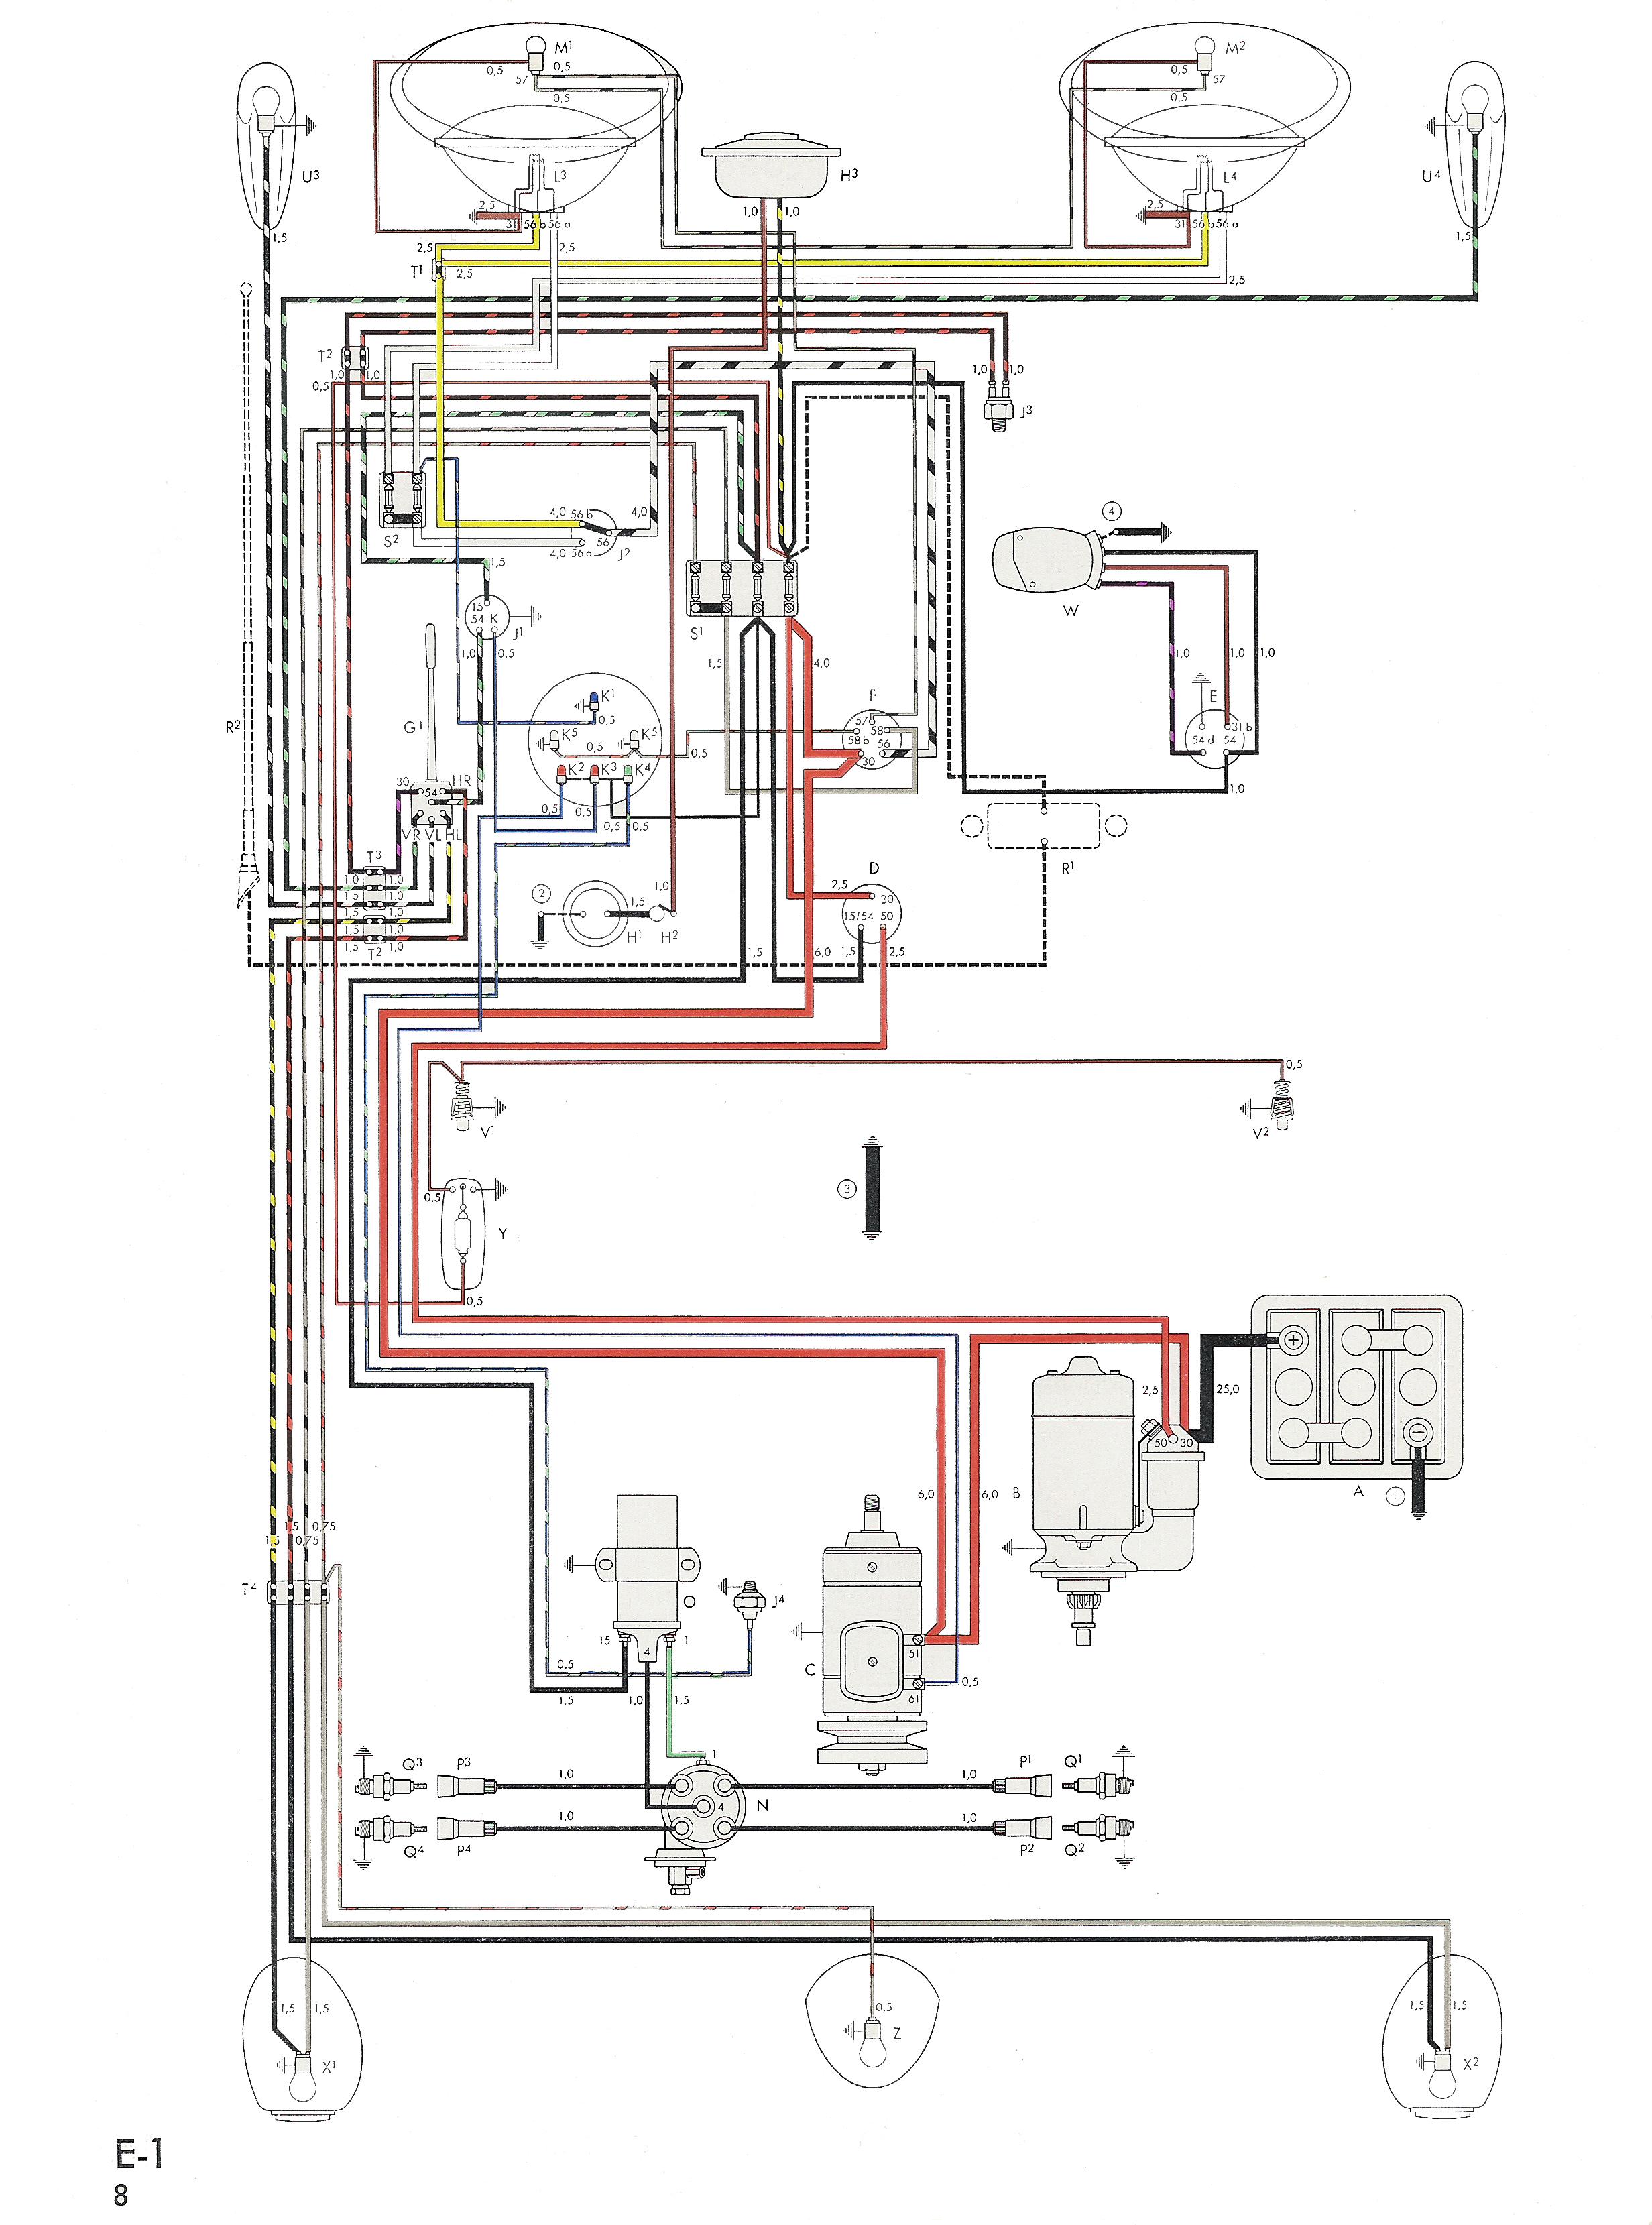 bug_58_USA_300dpi 72 super beetle wiring diagram dolgular com 74 super beetle wiring diagram at reclaimingppi.co